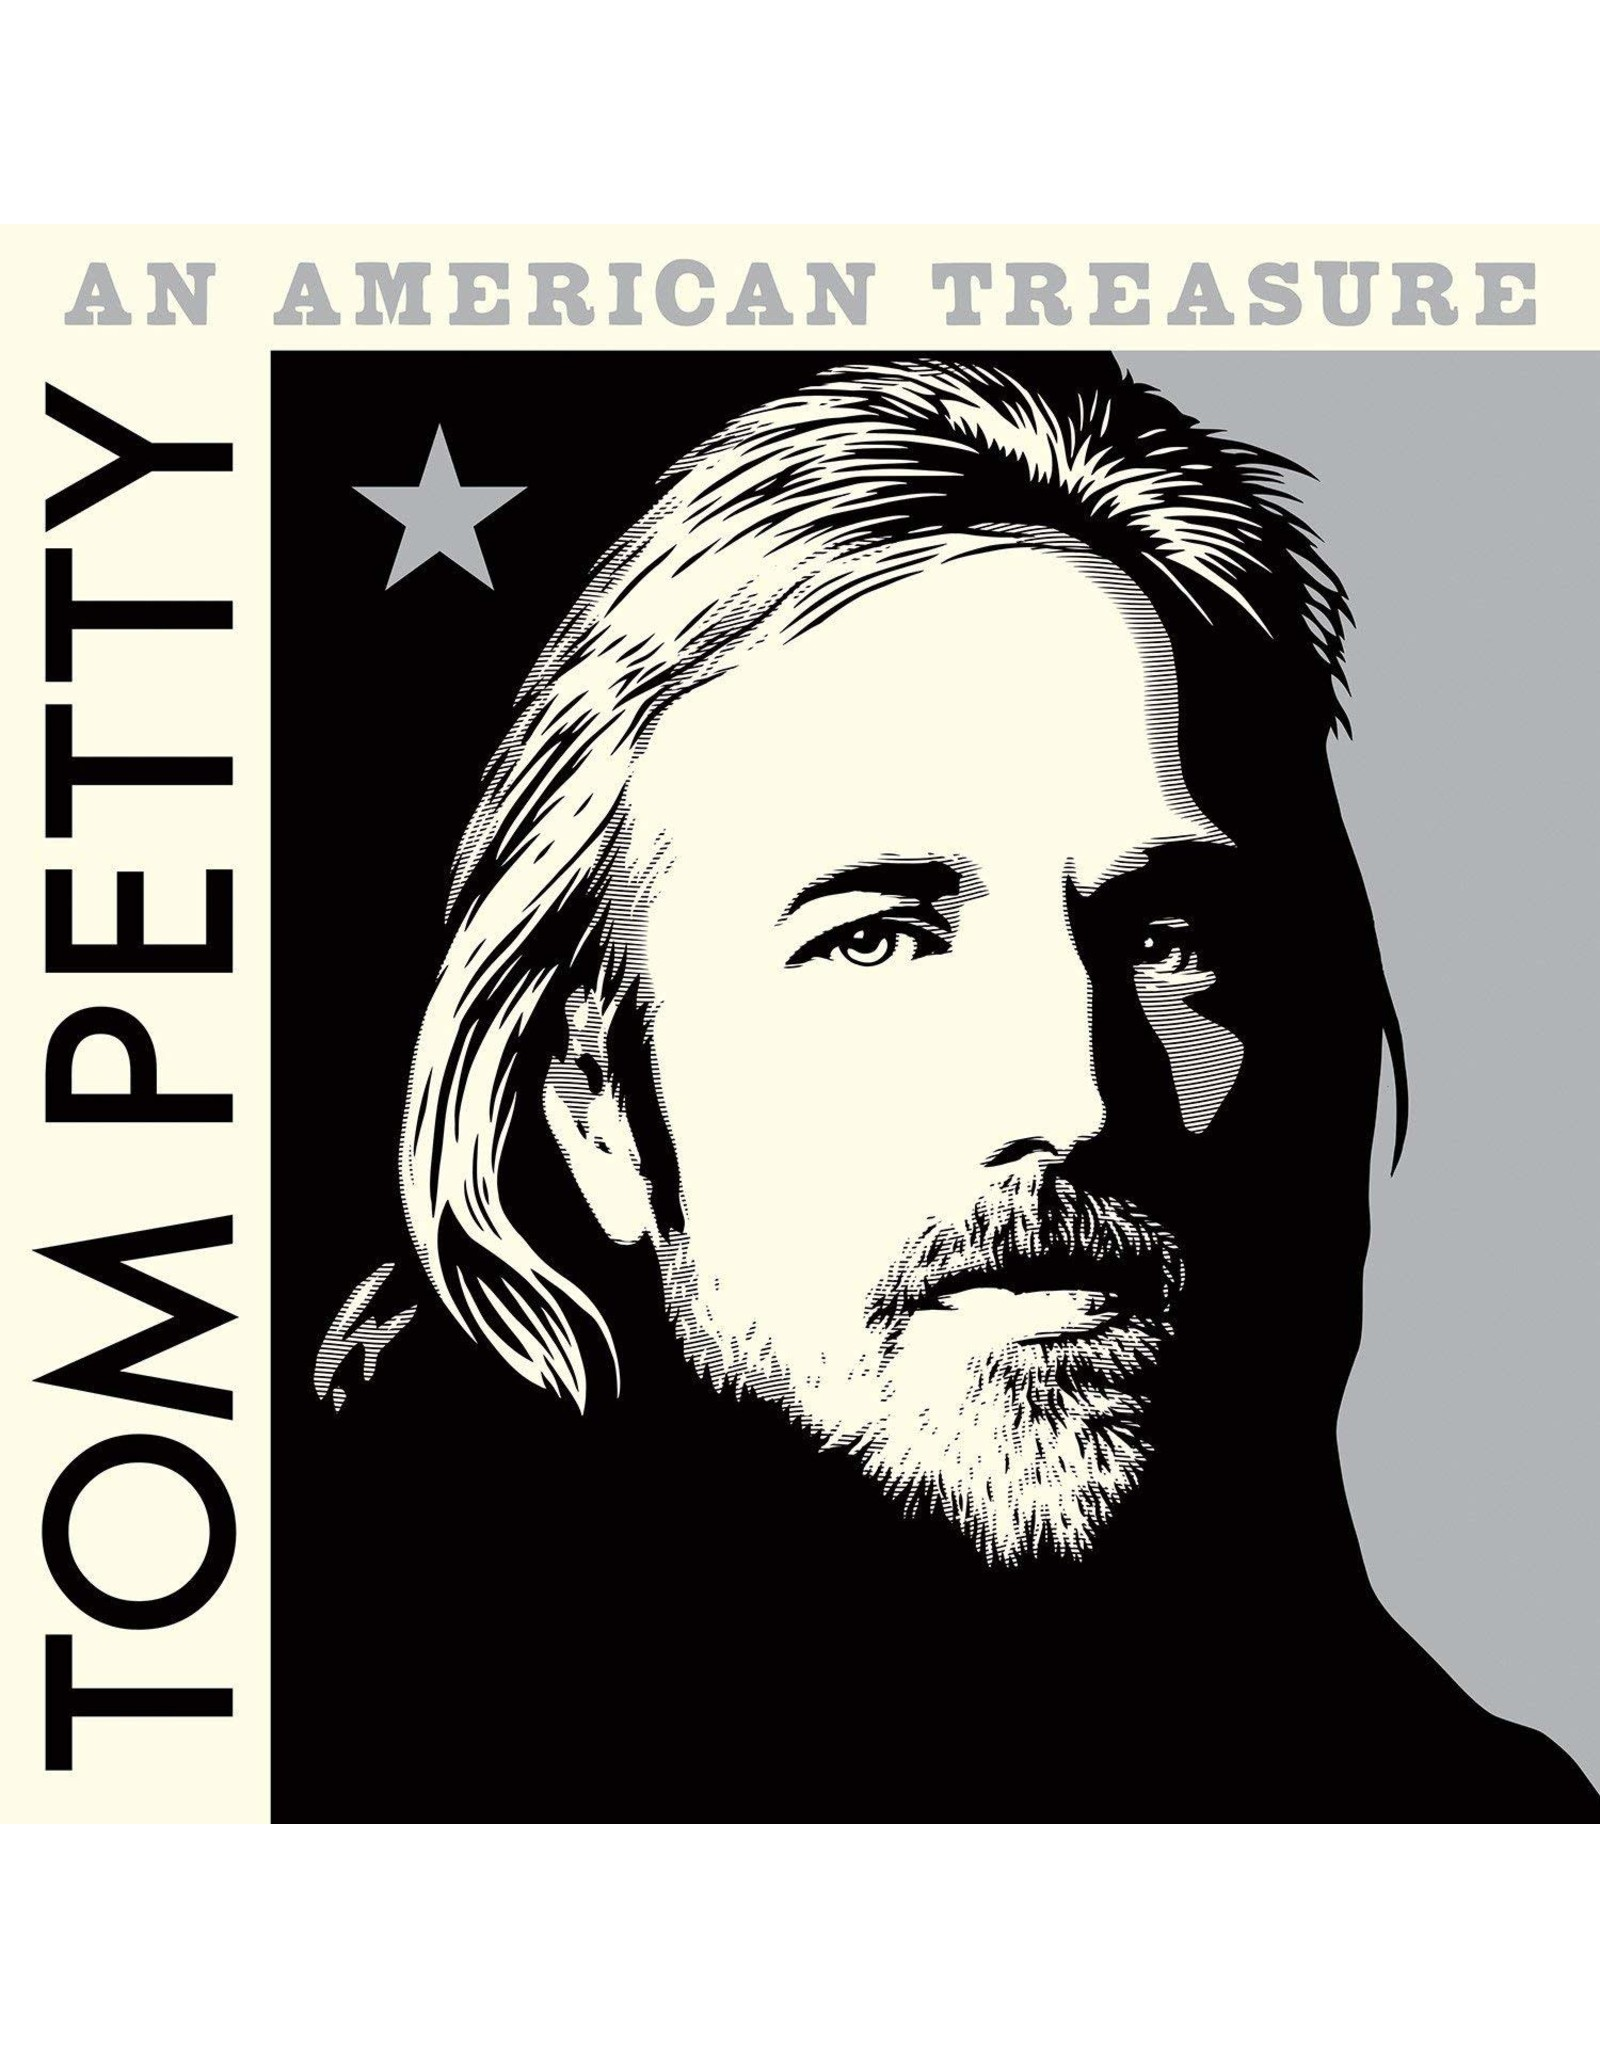 Petty, Tom - An American Treasure CD